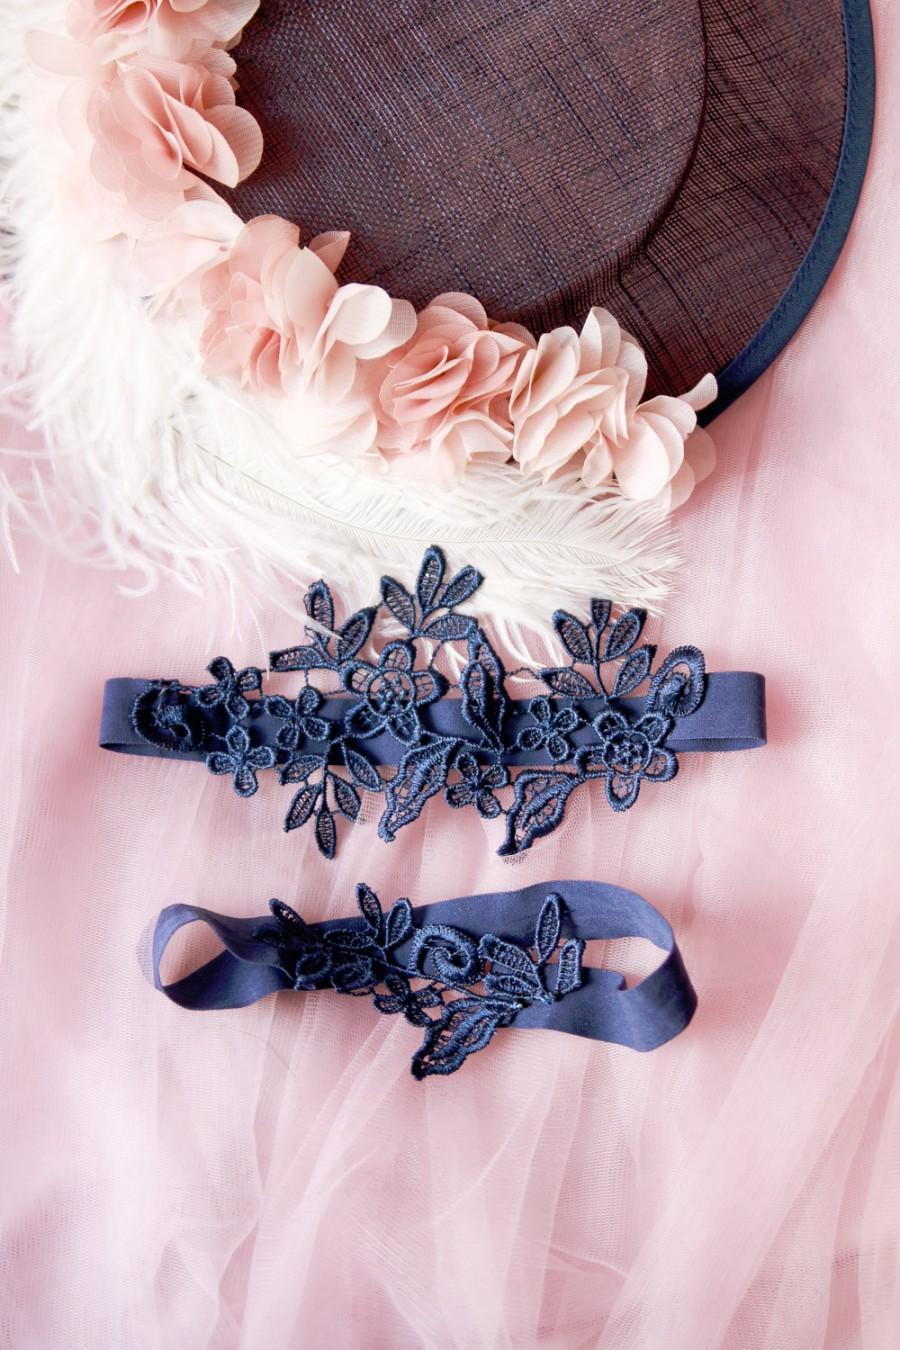 Mariage - Wedding Garter Set Bridal Garter Set - Navy Blue Lace Garters - Keepsake Garter Toss Garter Prom Garter Something Blue Garters